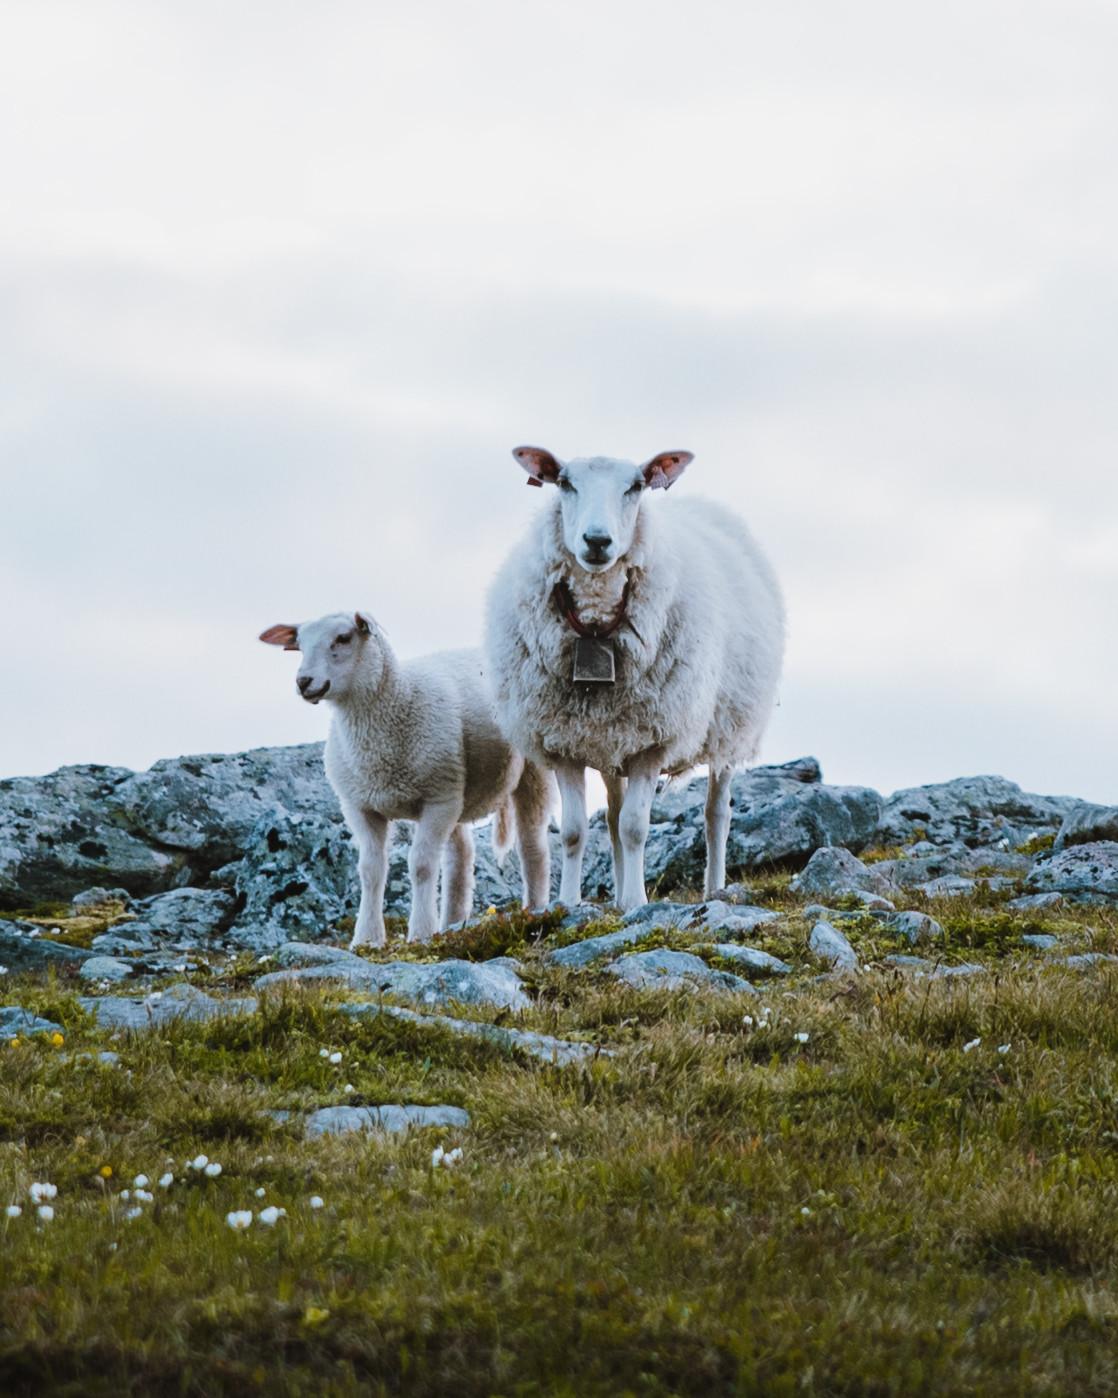 Vesterålen Sheep